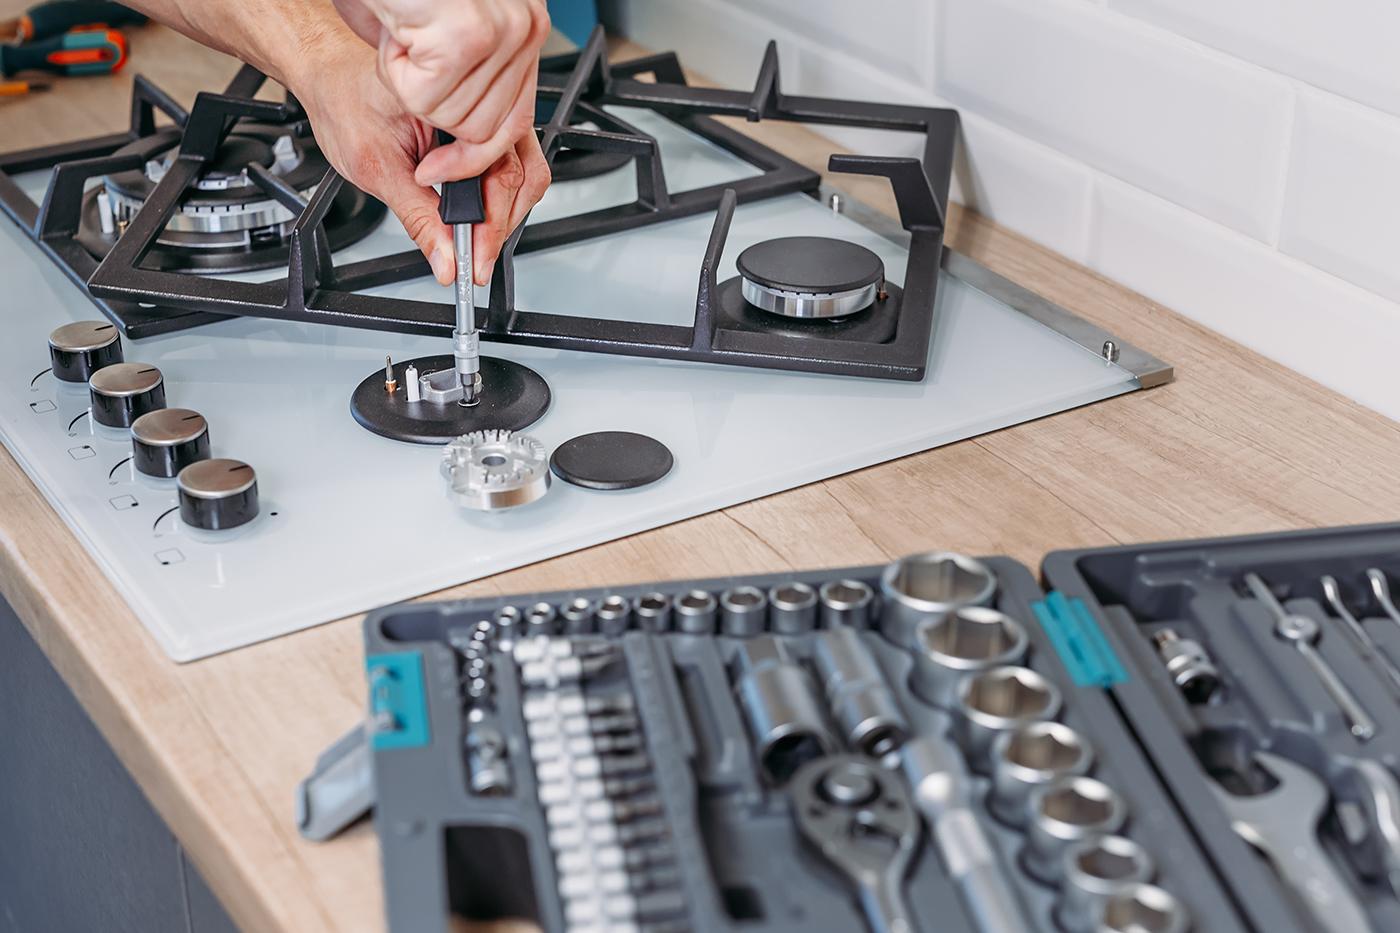 Oven Stove Range Repair